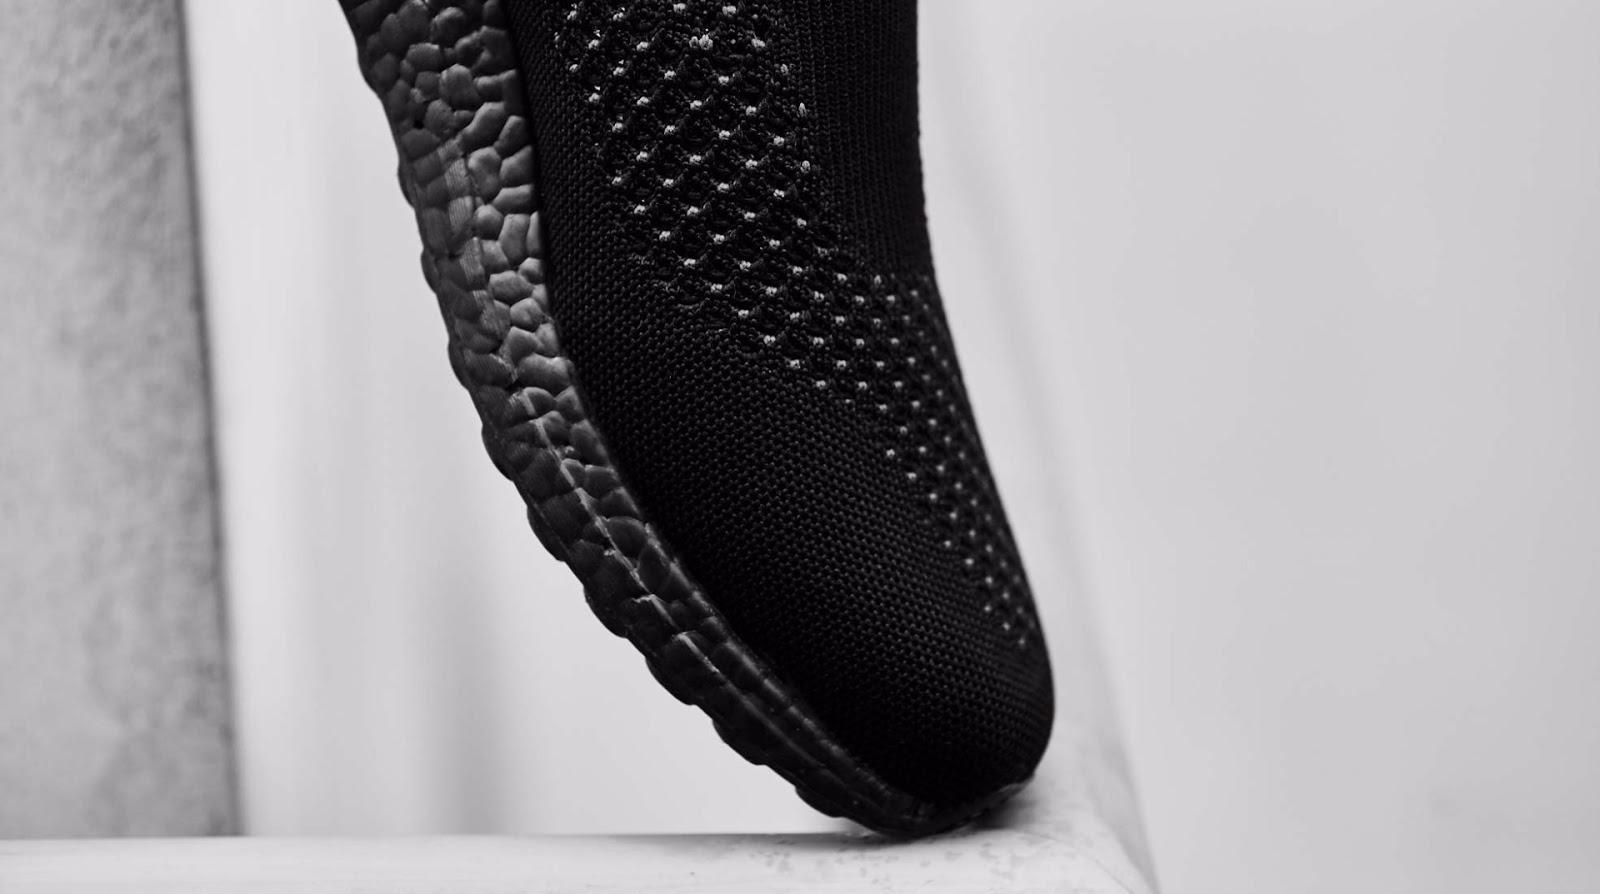 Adidas Soccer Drops ACE 16 UltraBOOST